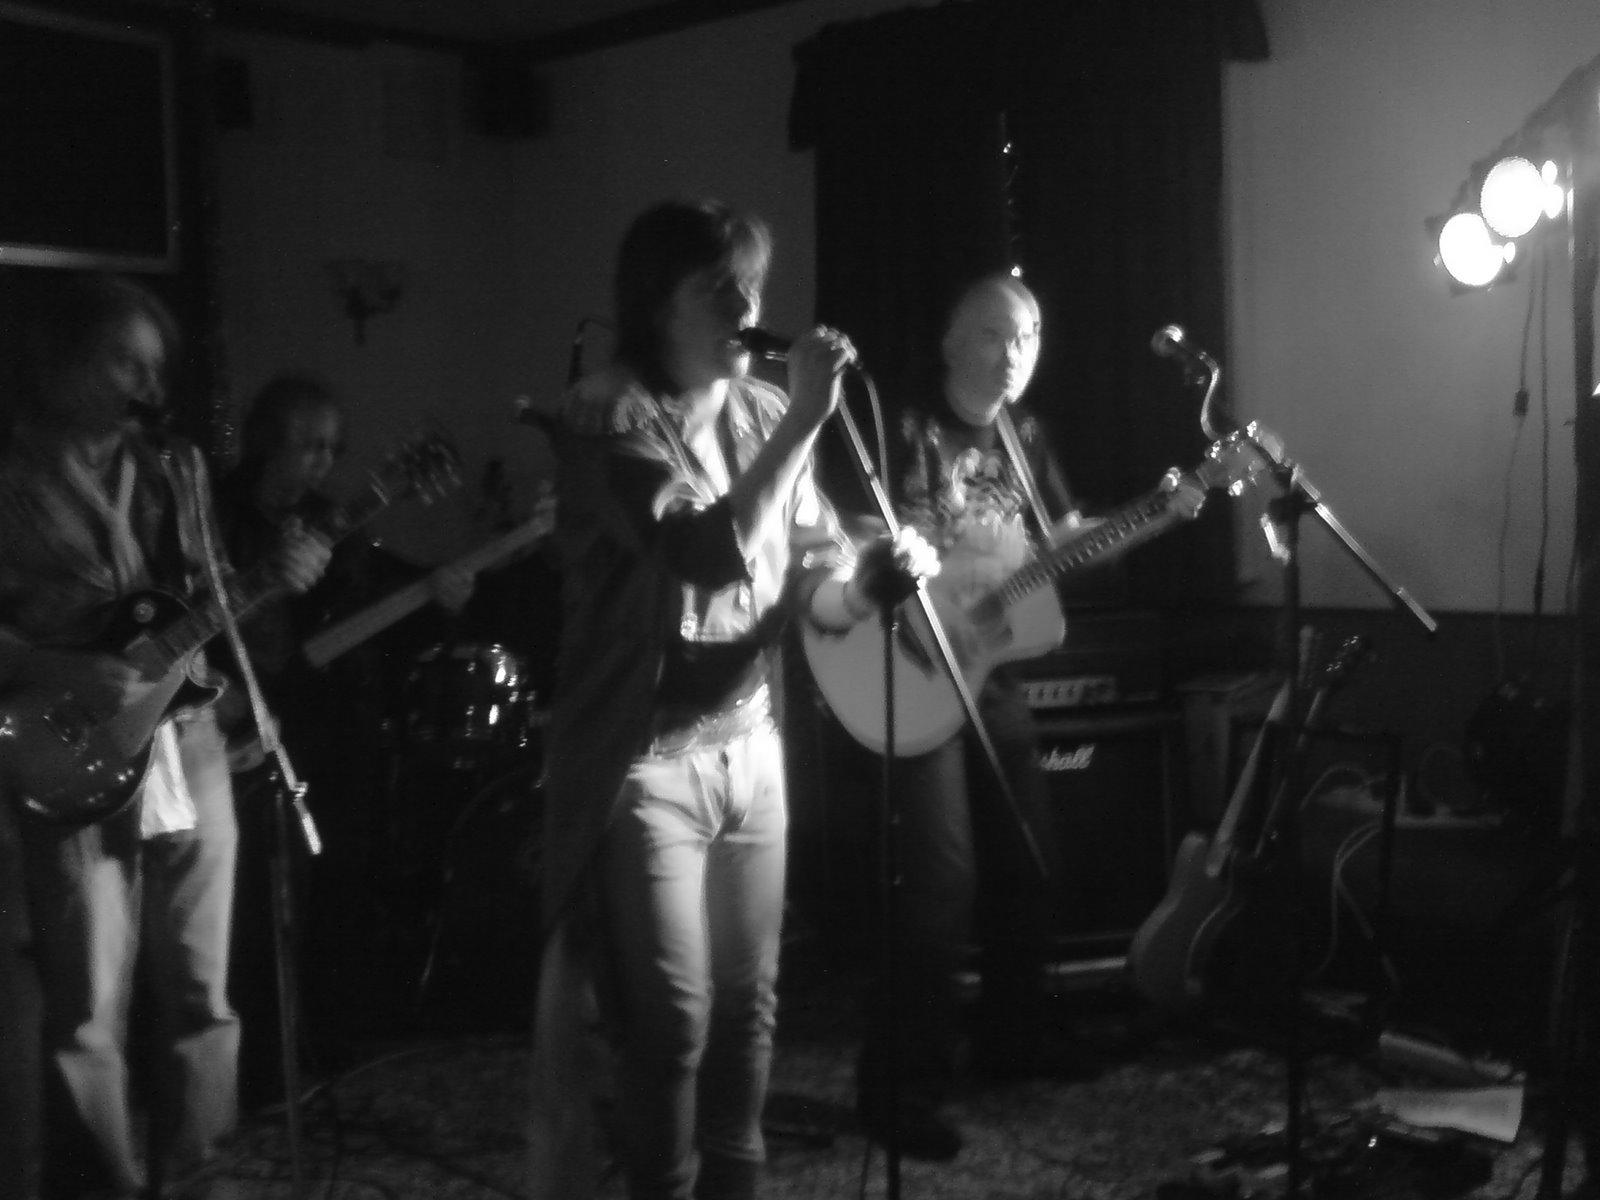 The Stones – 3 horseshoes – Matlock Green 19th Dec 2008